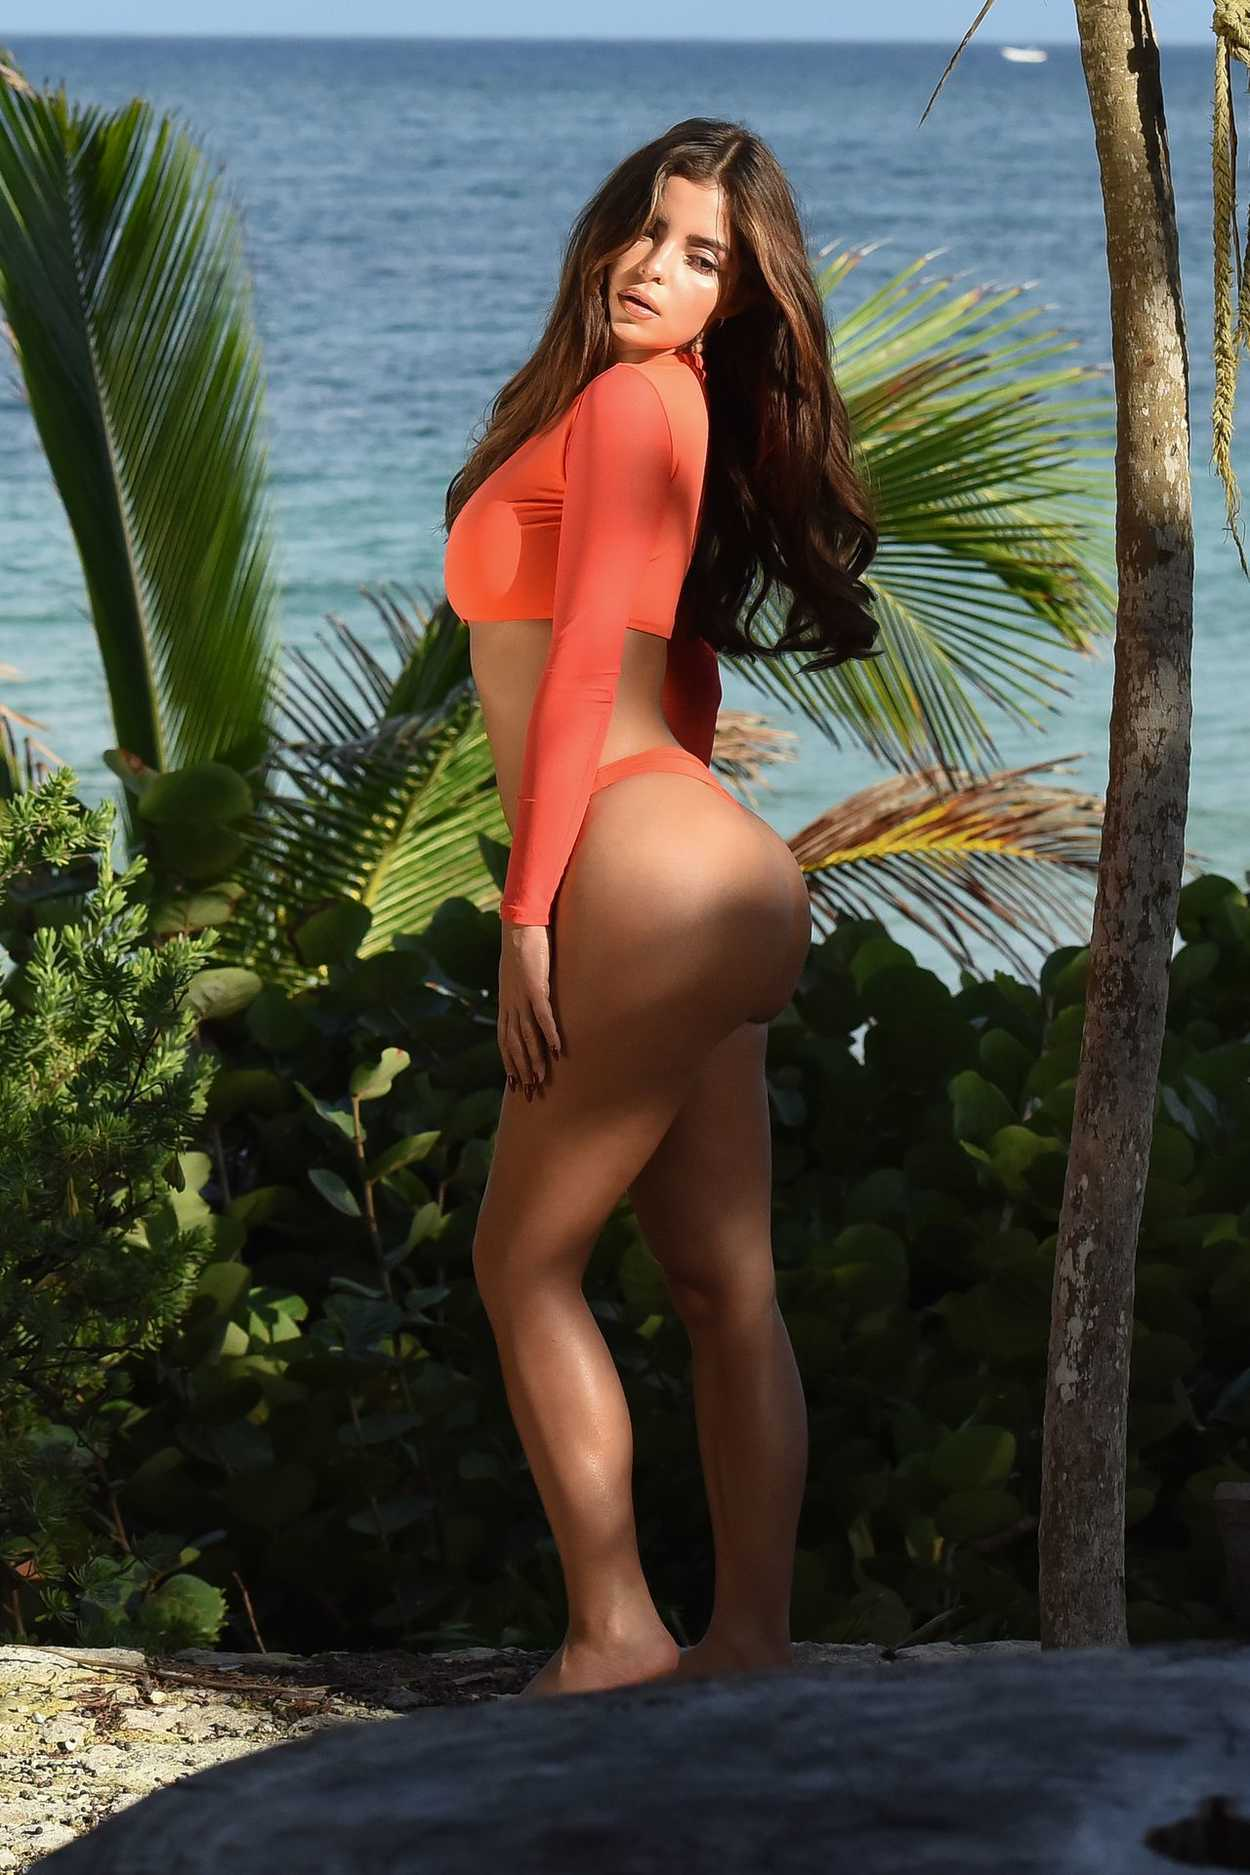 Demi Rose Does A Bikini Photoshoot On The Beach In Tulum